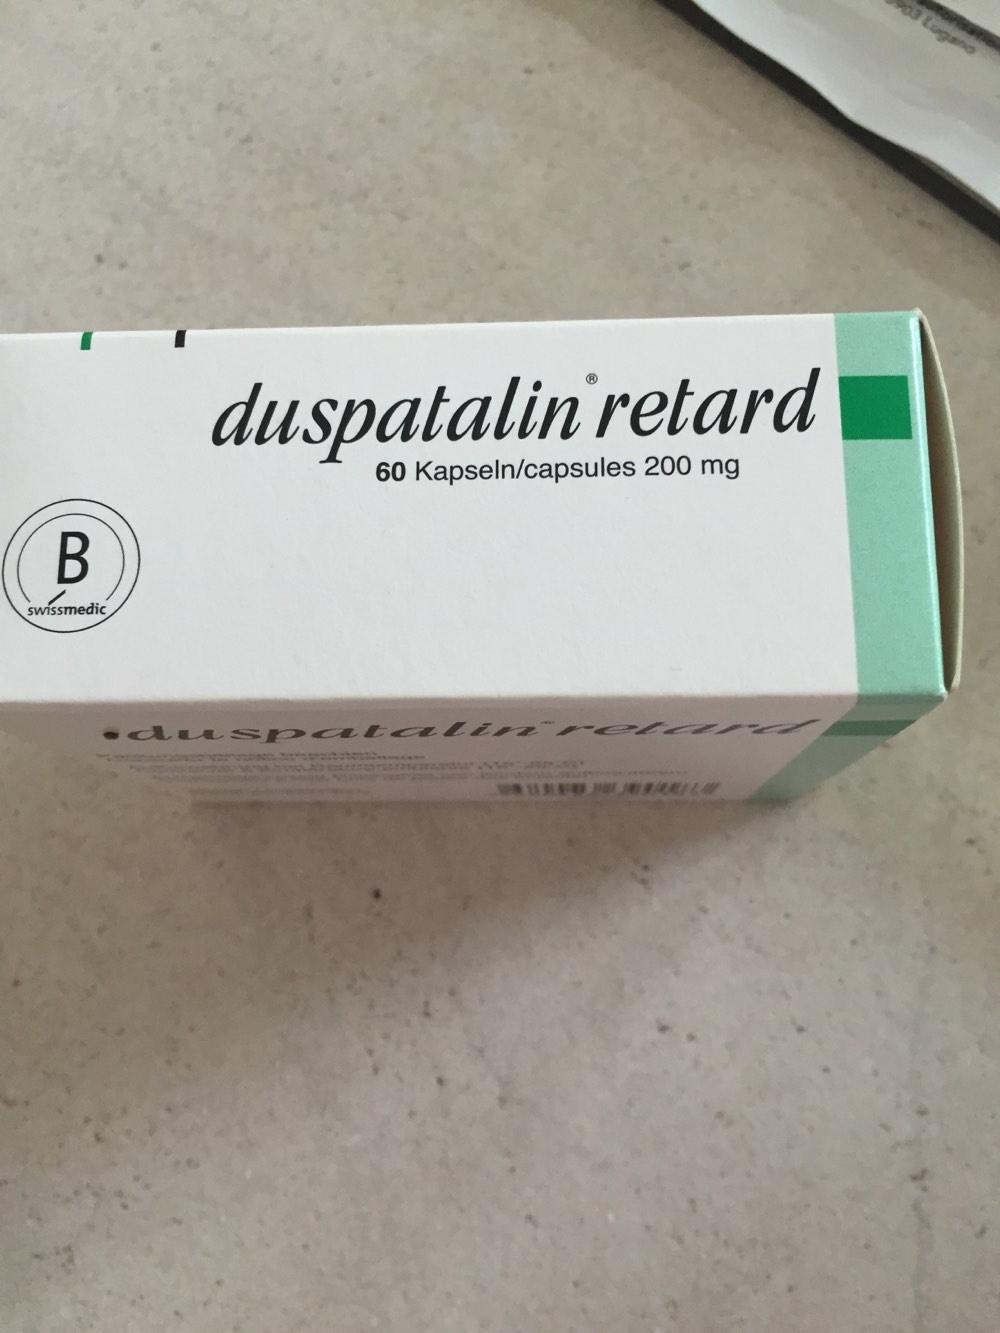 Duspatalin  retard - Product